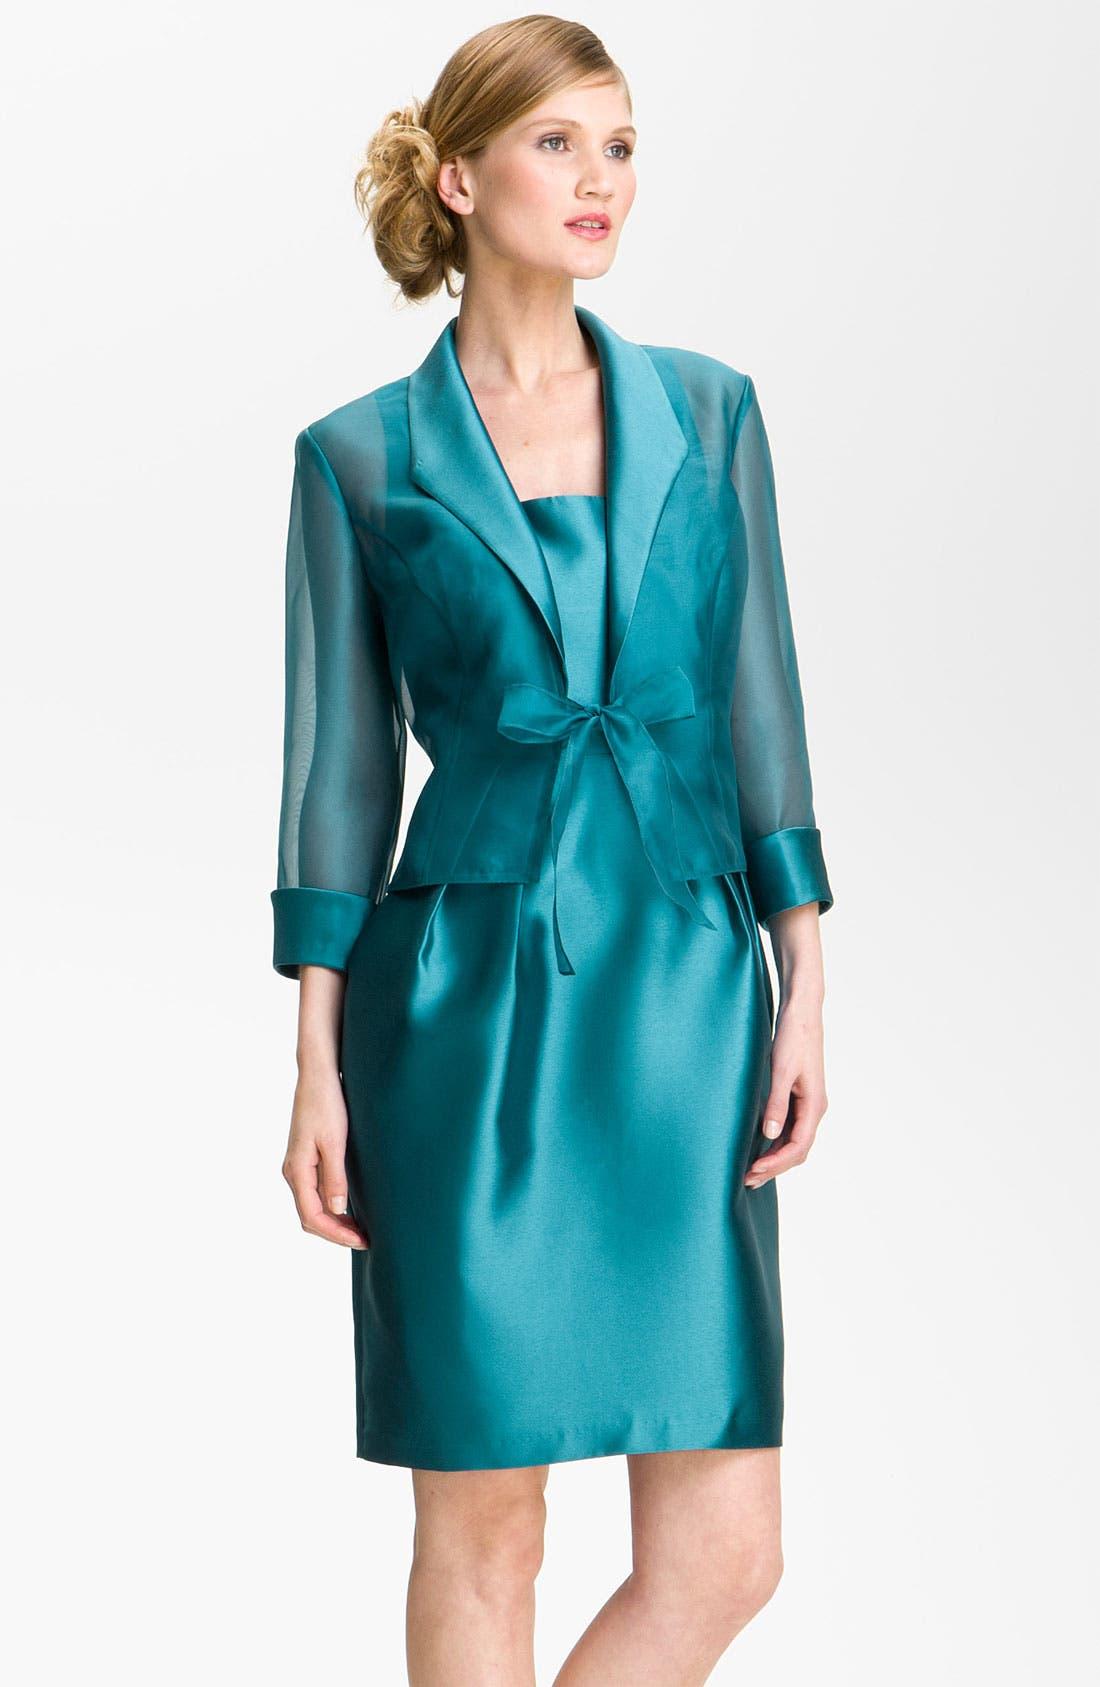 Alternate Image 1 Selected - Alex Evenings Square Neck Sheath Dress & Jacket